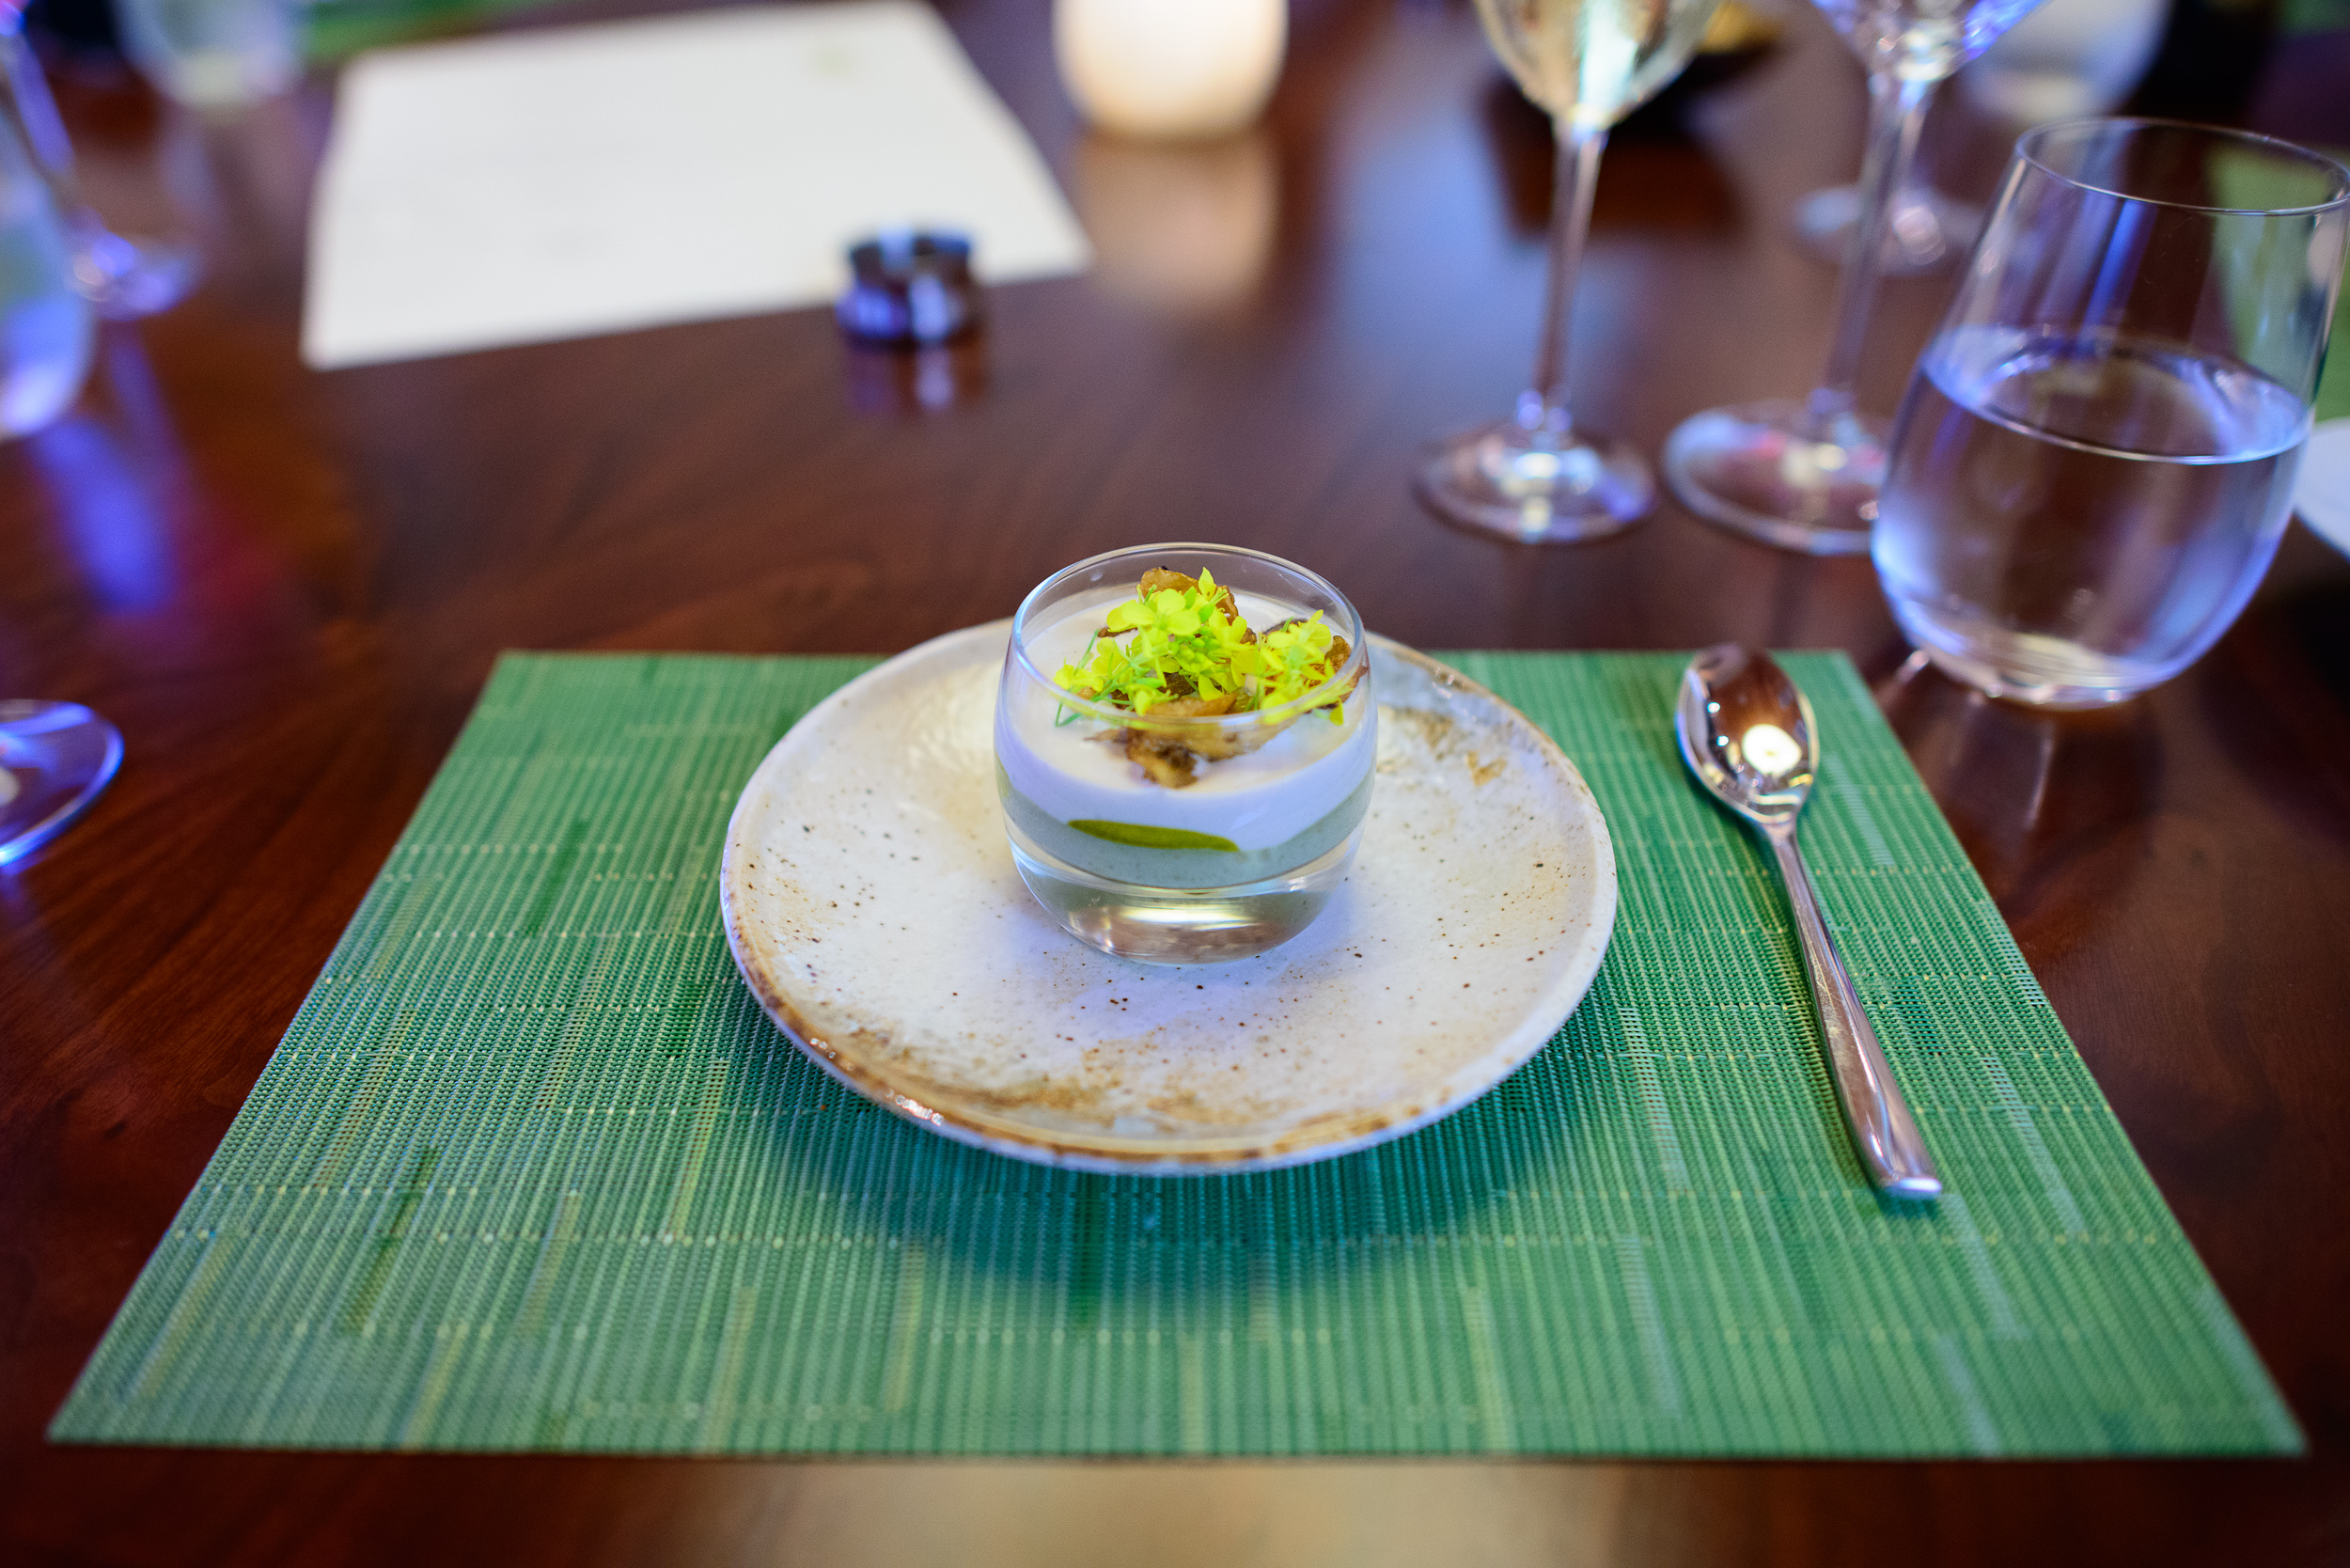 1st Course: Pansey, custard, egg, yogurt (elements)